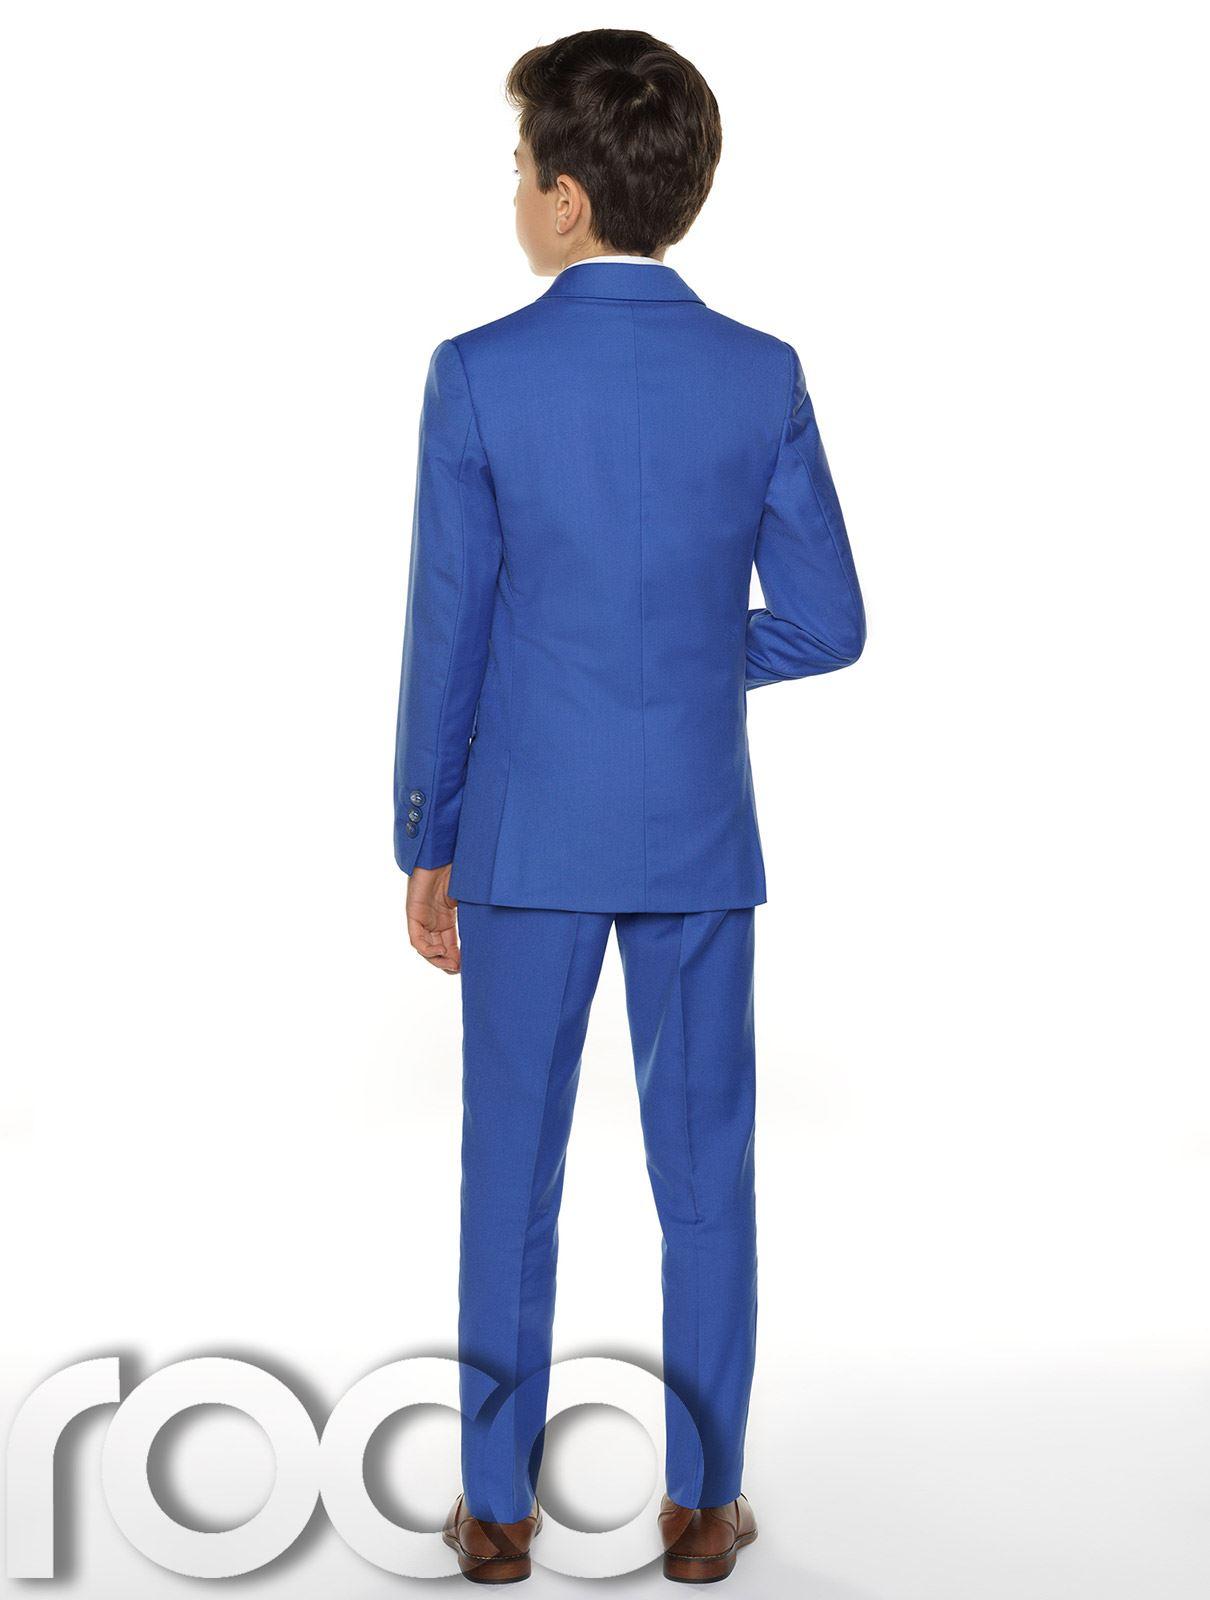 Garcons-Costume-Bleu-Communion-Costume-Bleu-Communion-Costume miniature 13